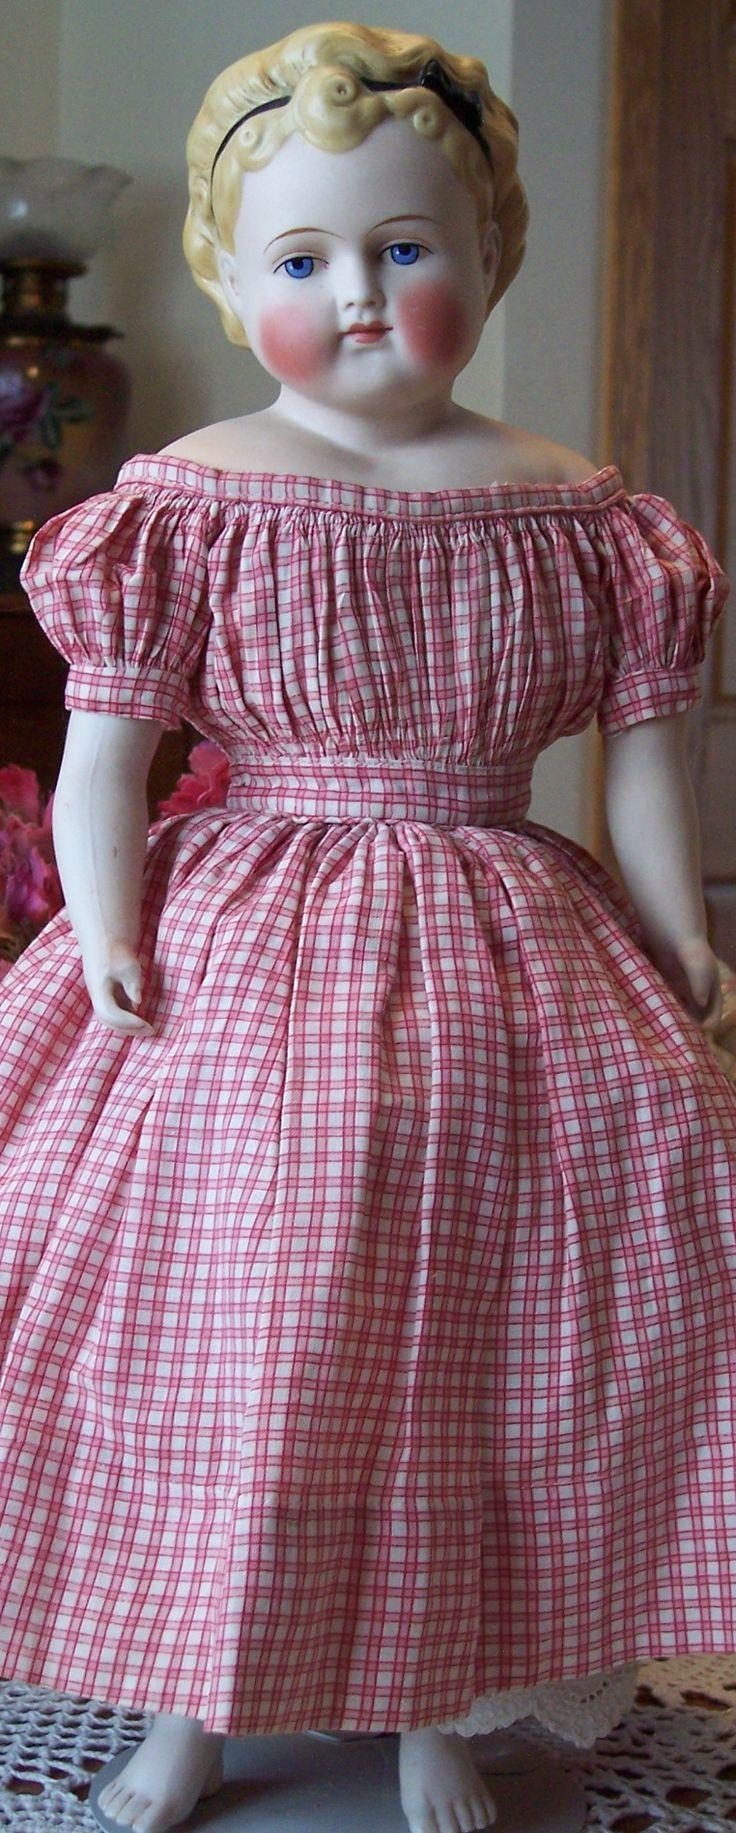 Stunning ABG doll with BARE FEET! #DollShopsUnited